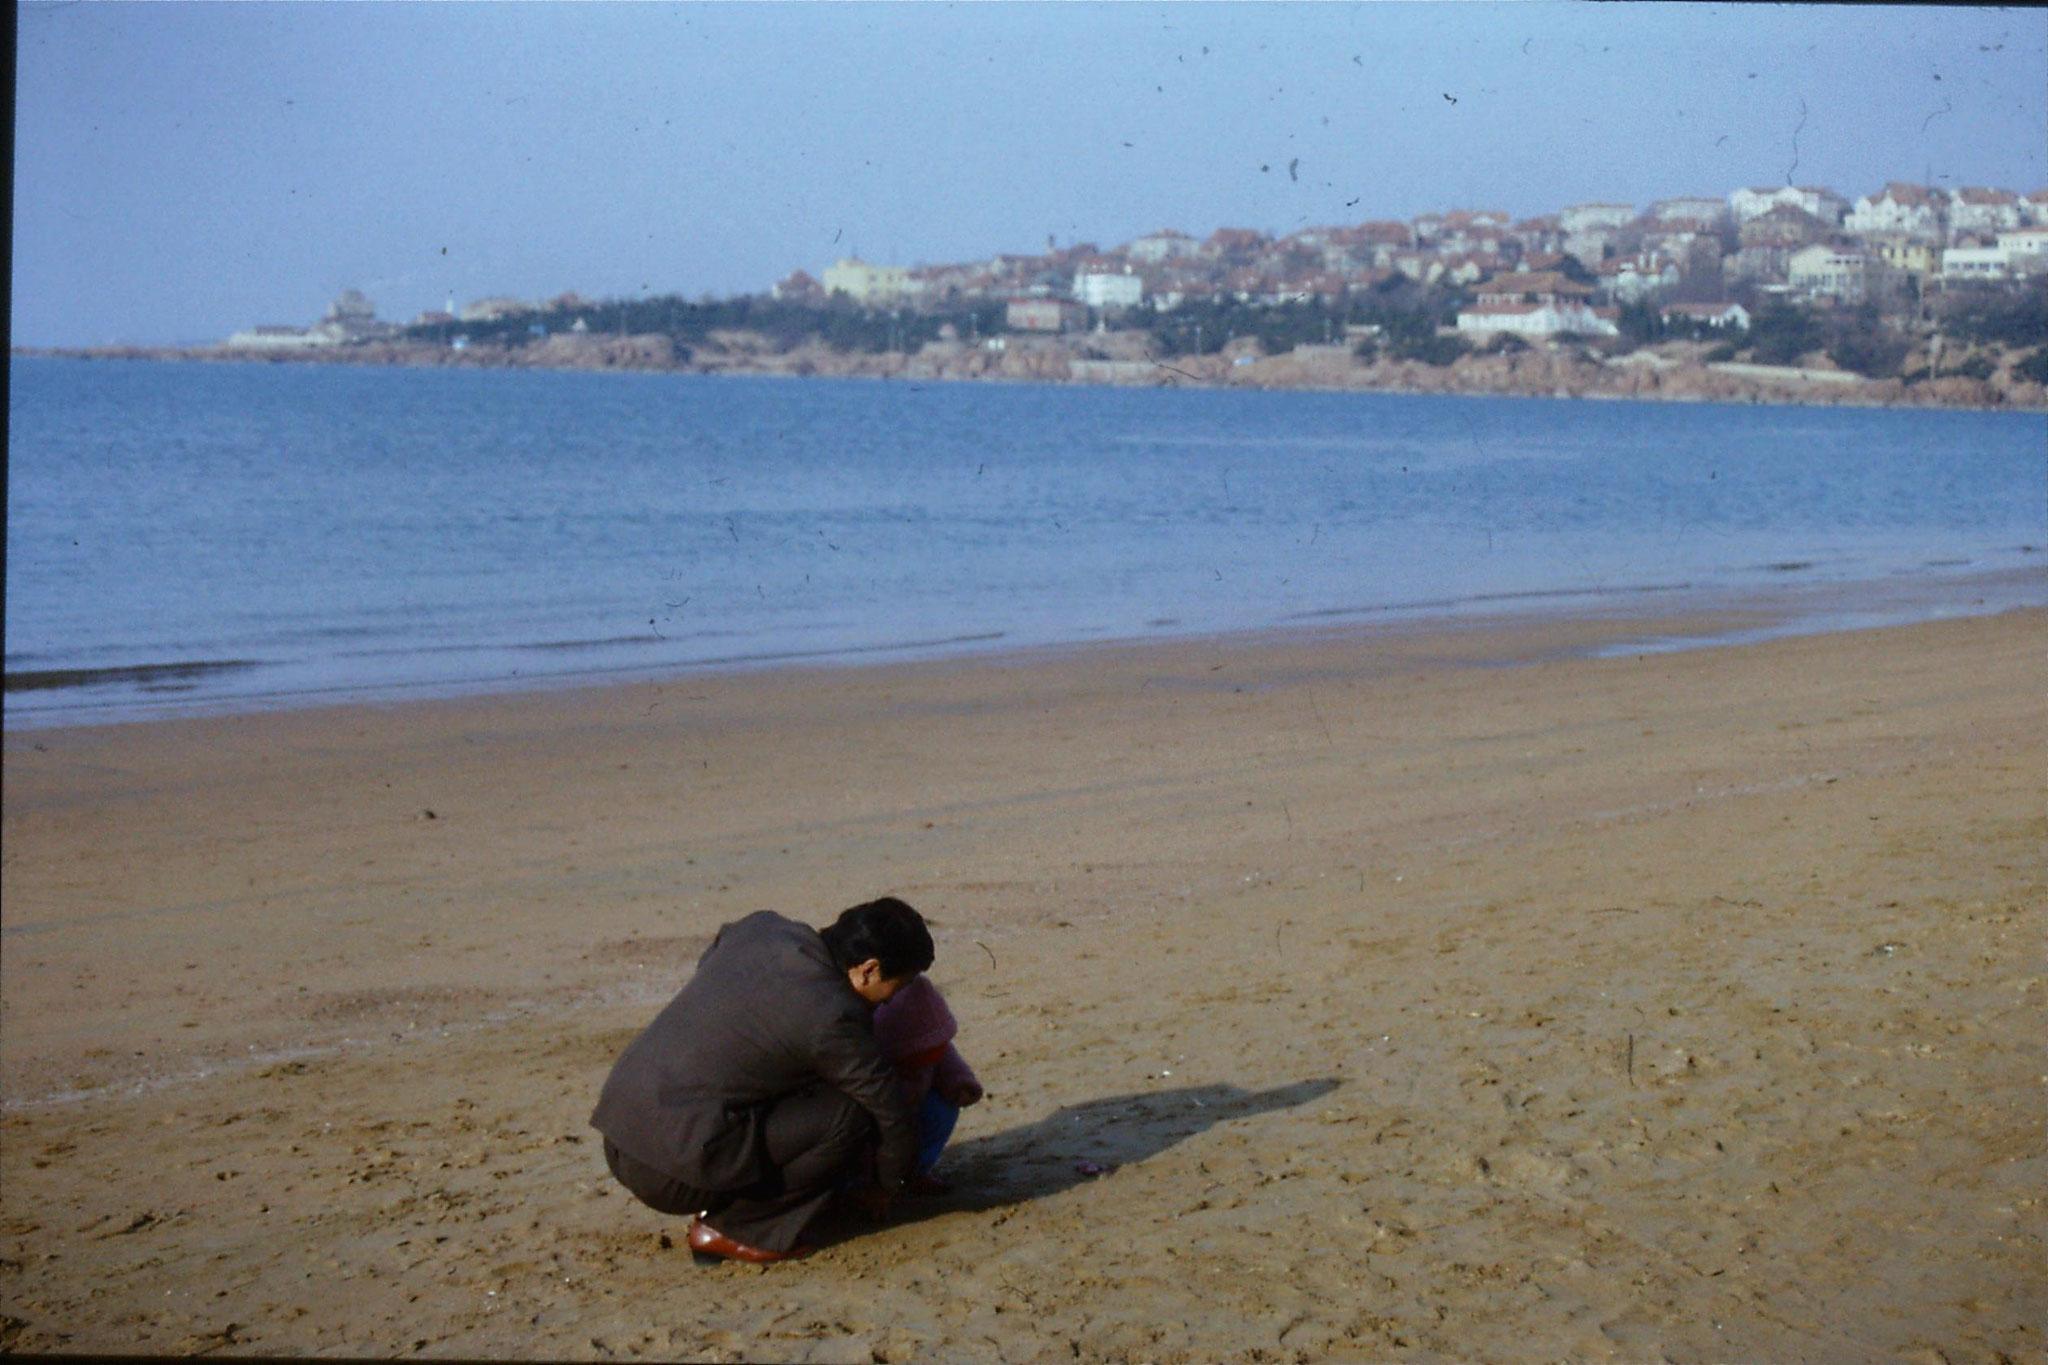 14/2/1989: 3: Qingdao beach